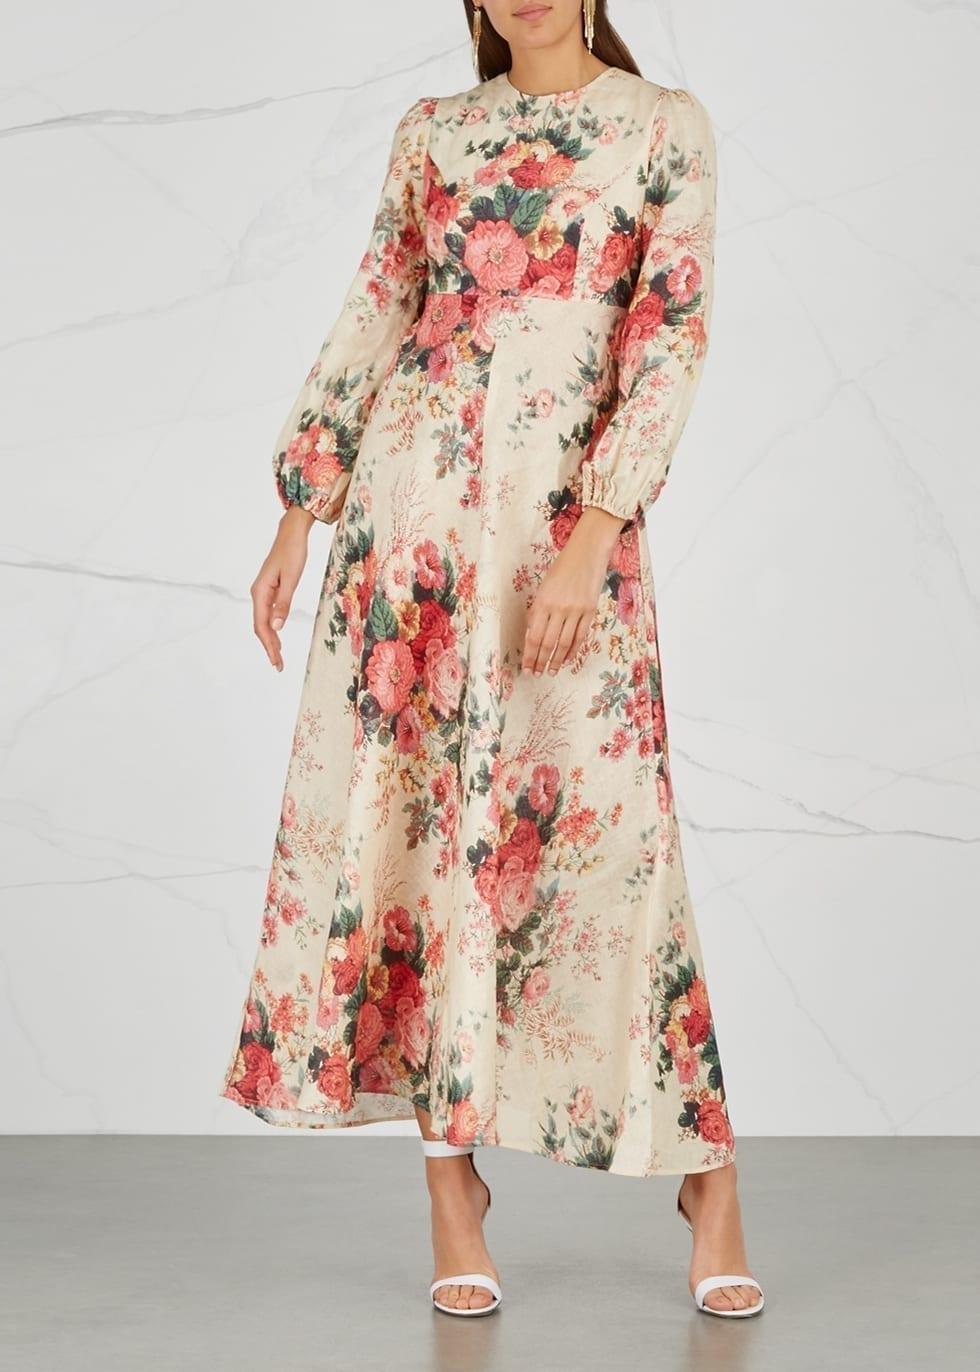 ZIMMERMANN Laelia Linen Cream / Floral Printed Dress